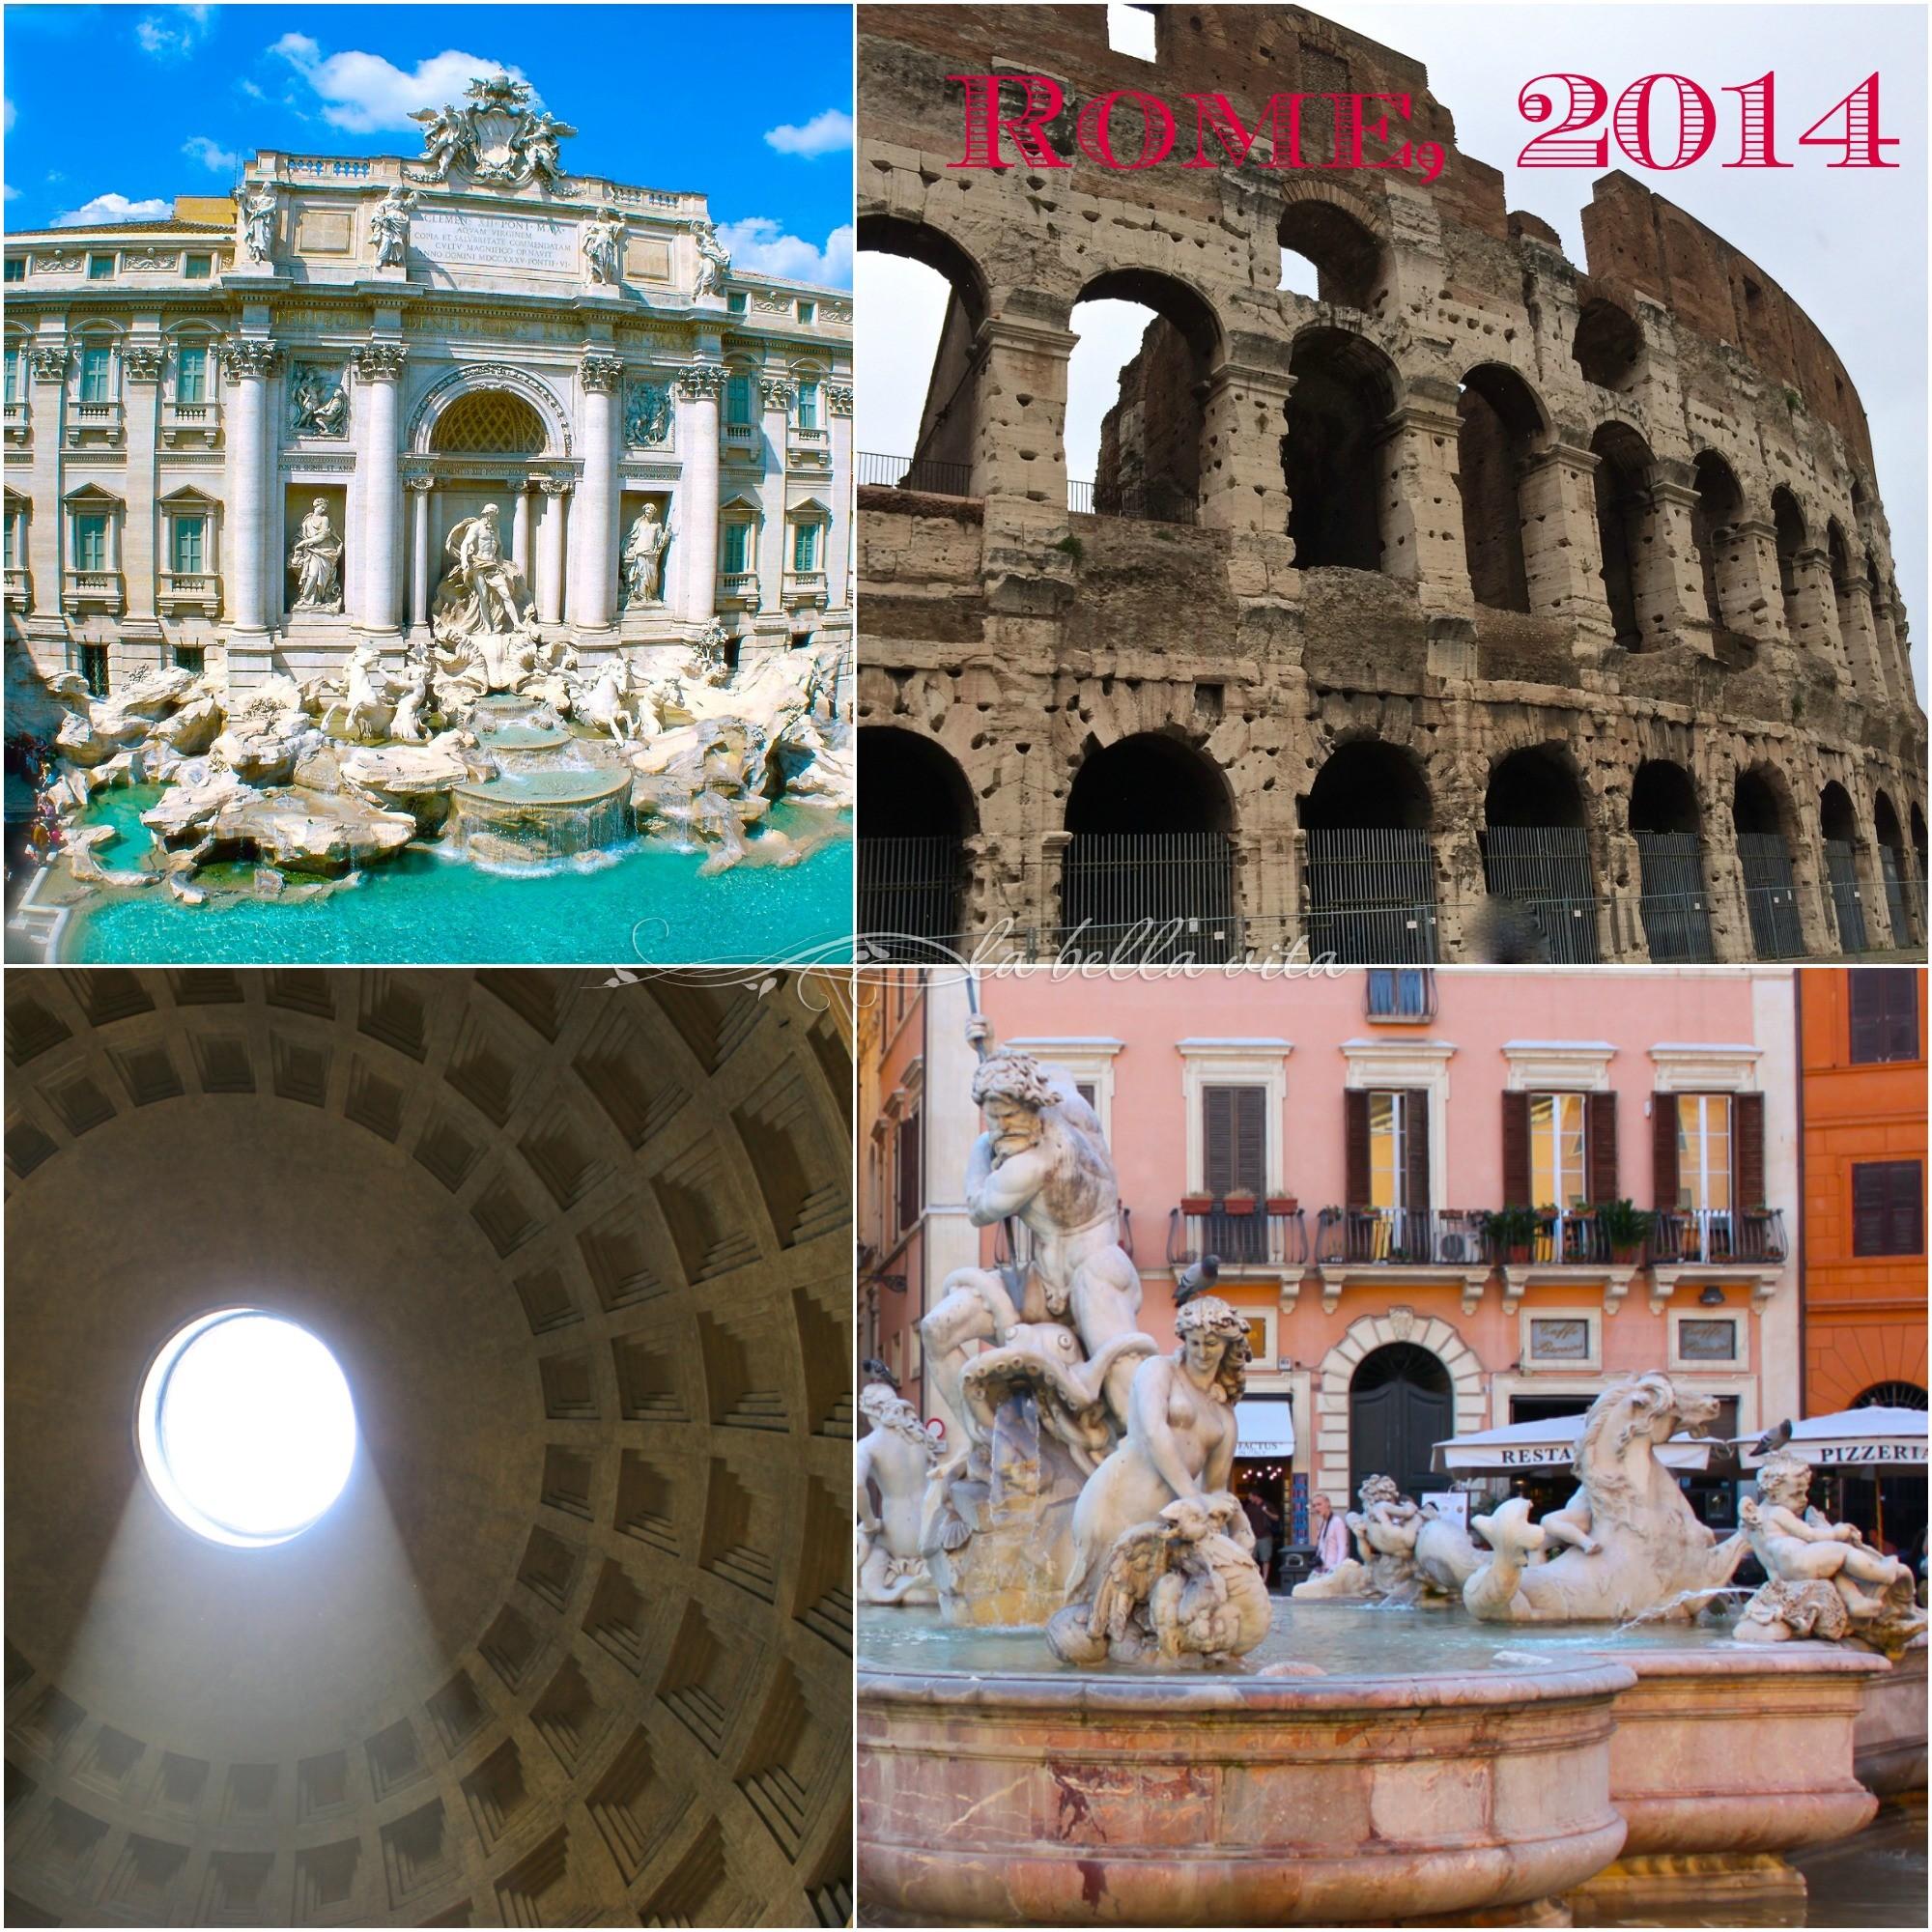 Rome, Venice and Modena travel